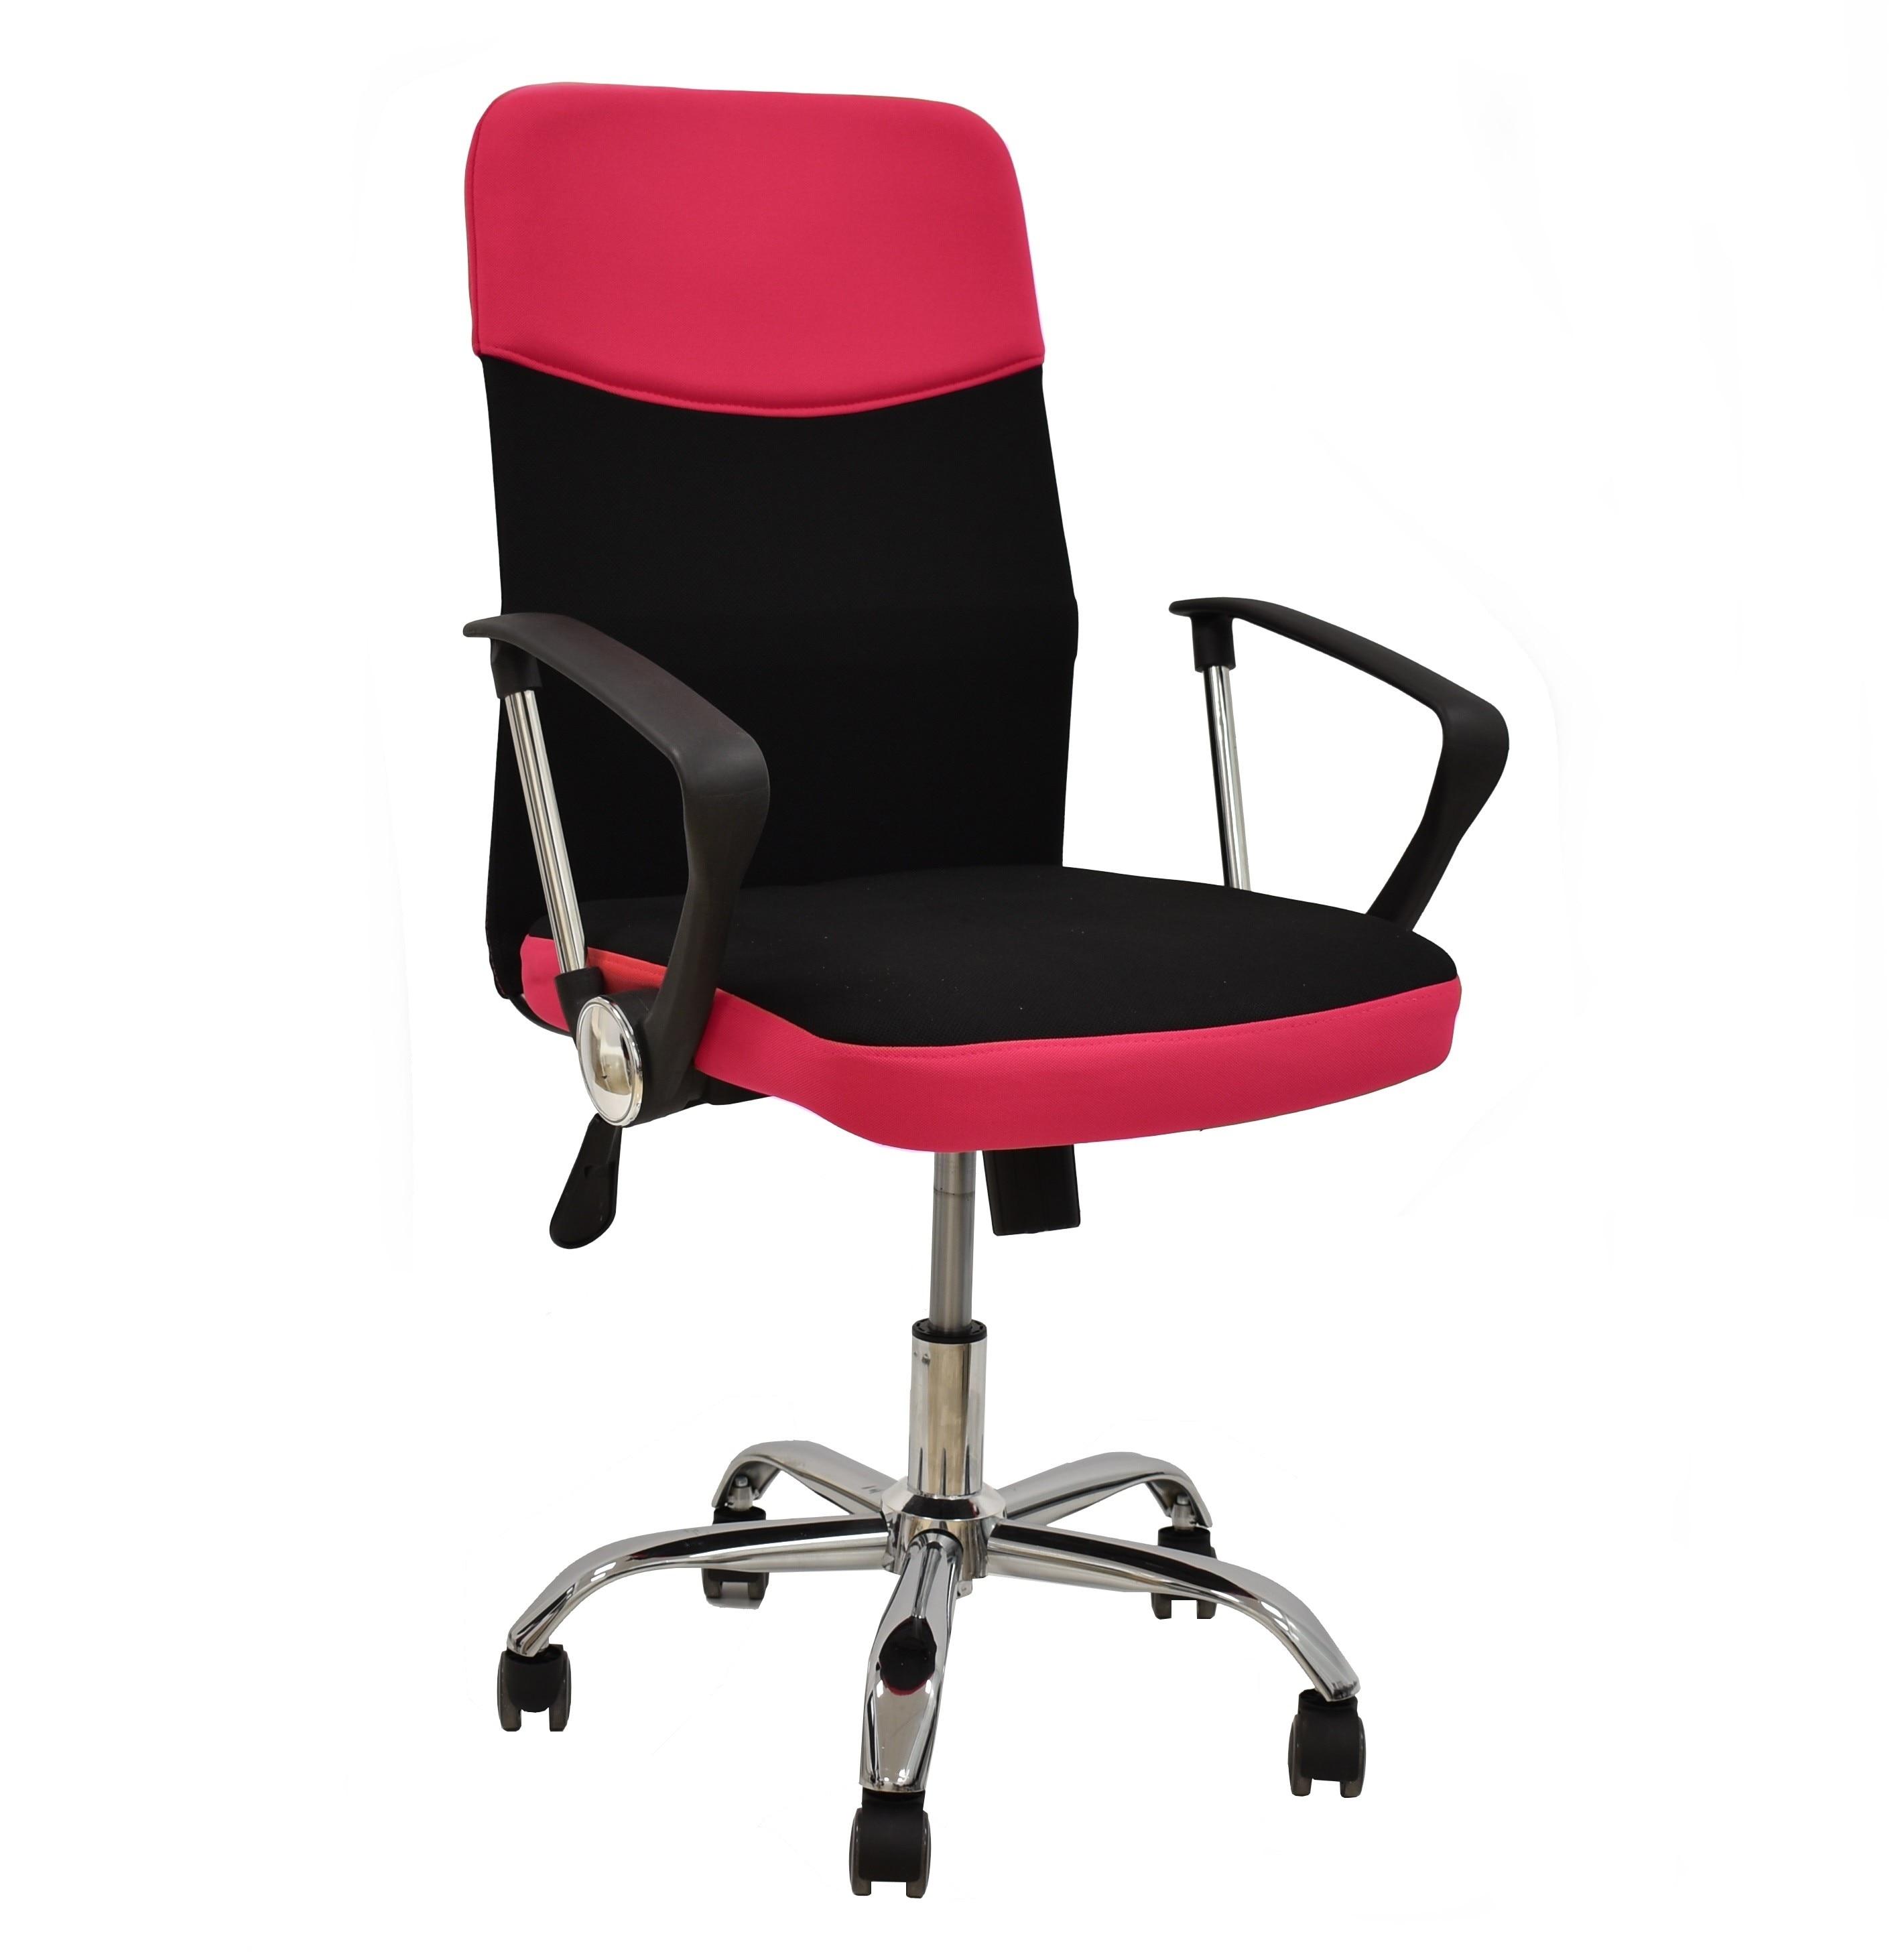 Office Armchair TANGO, Gas, Tilt, Fabric Black-pink